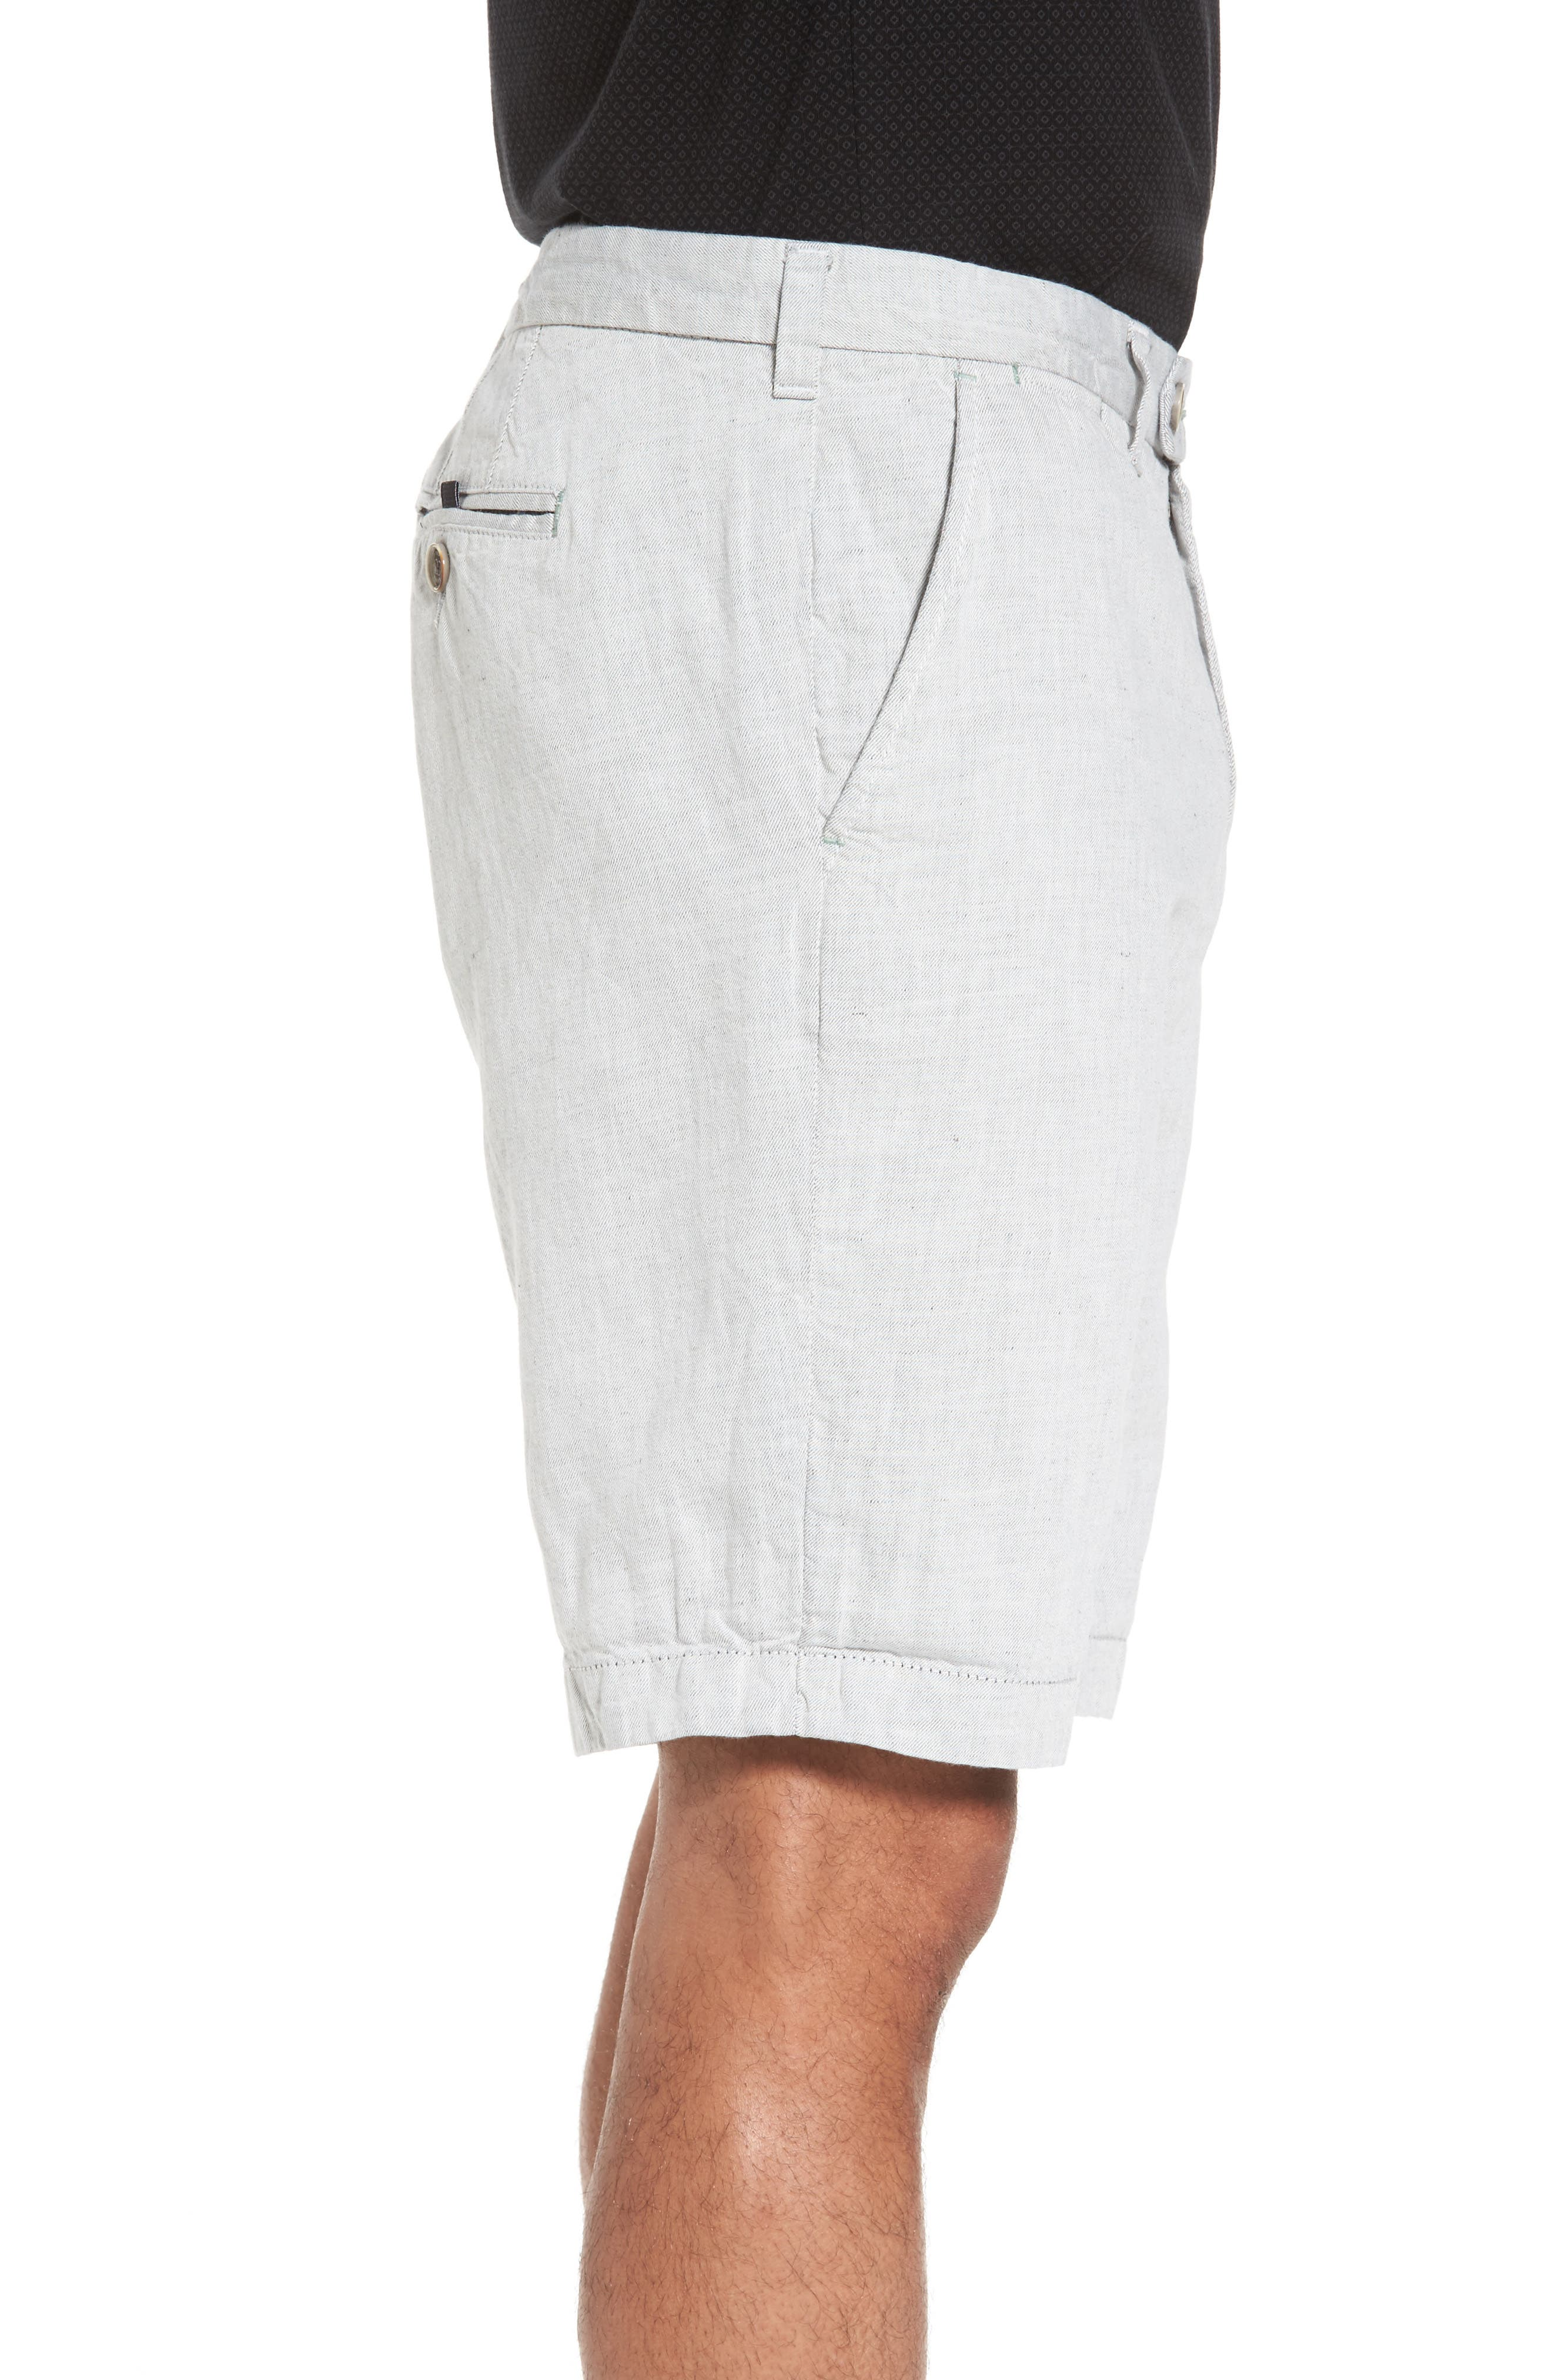 Frisho Cuff Denim Shorts,                             Alternate thumbnail 3, color,                             Light Grey